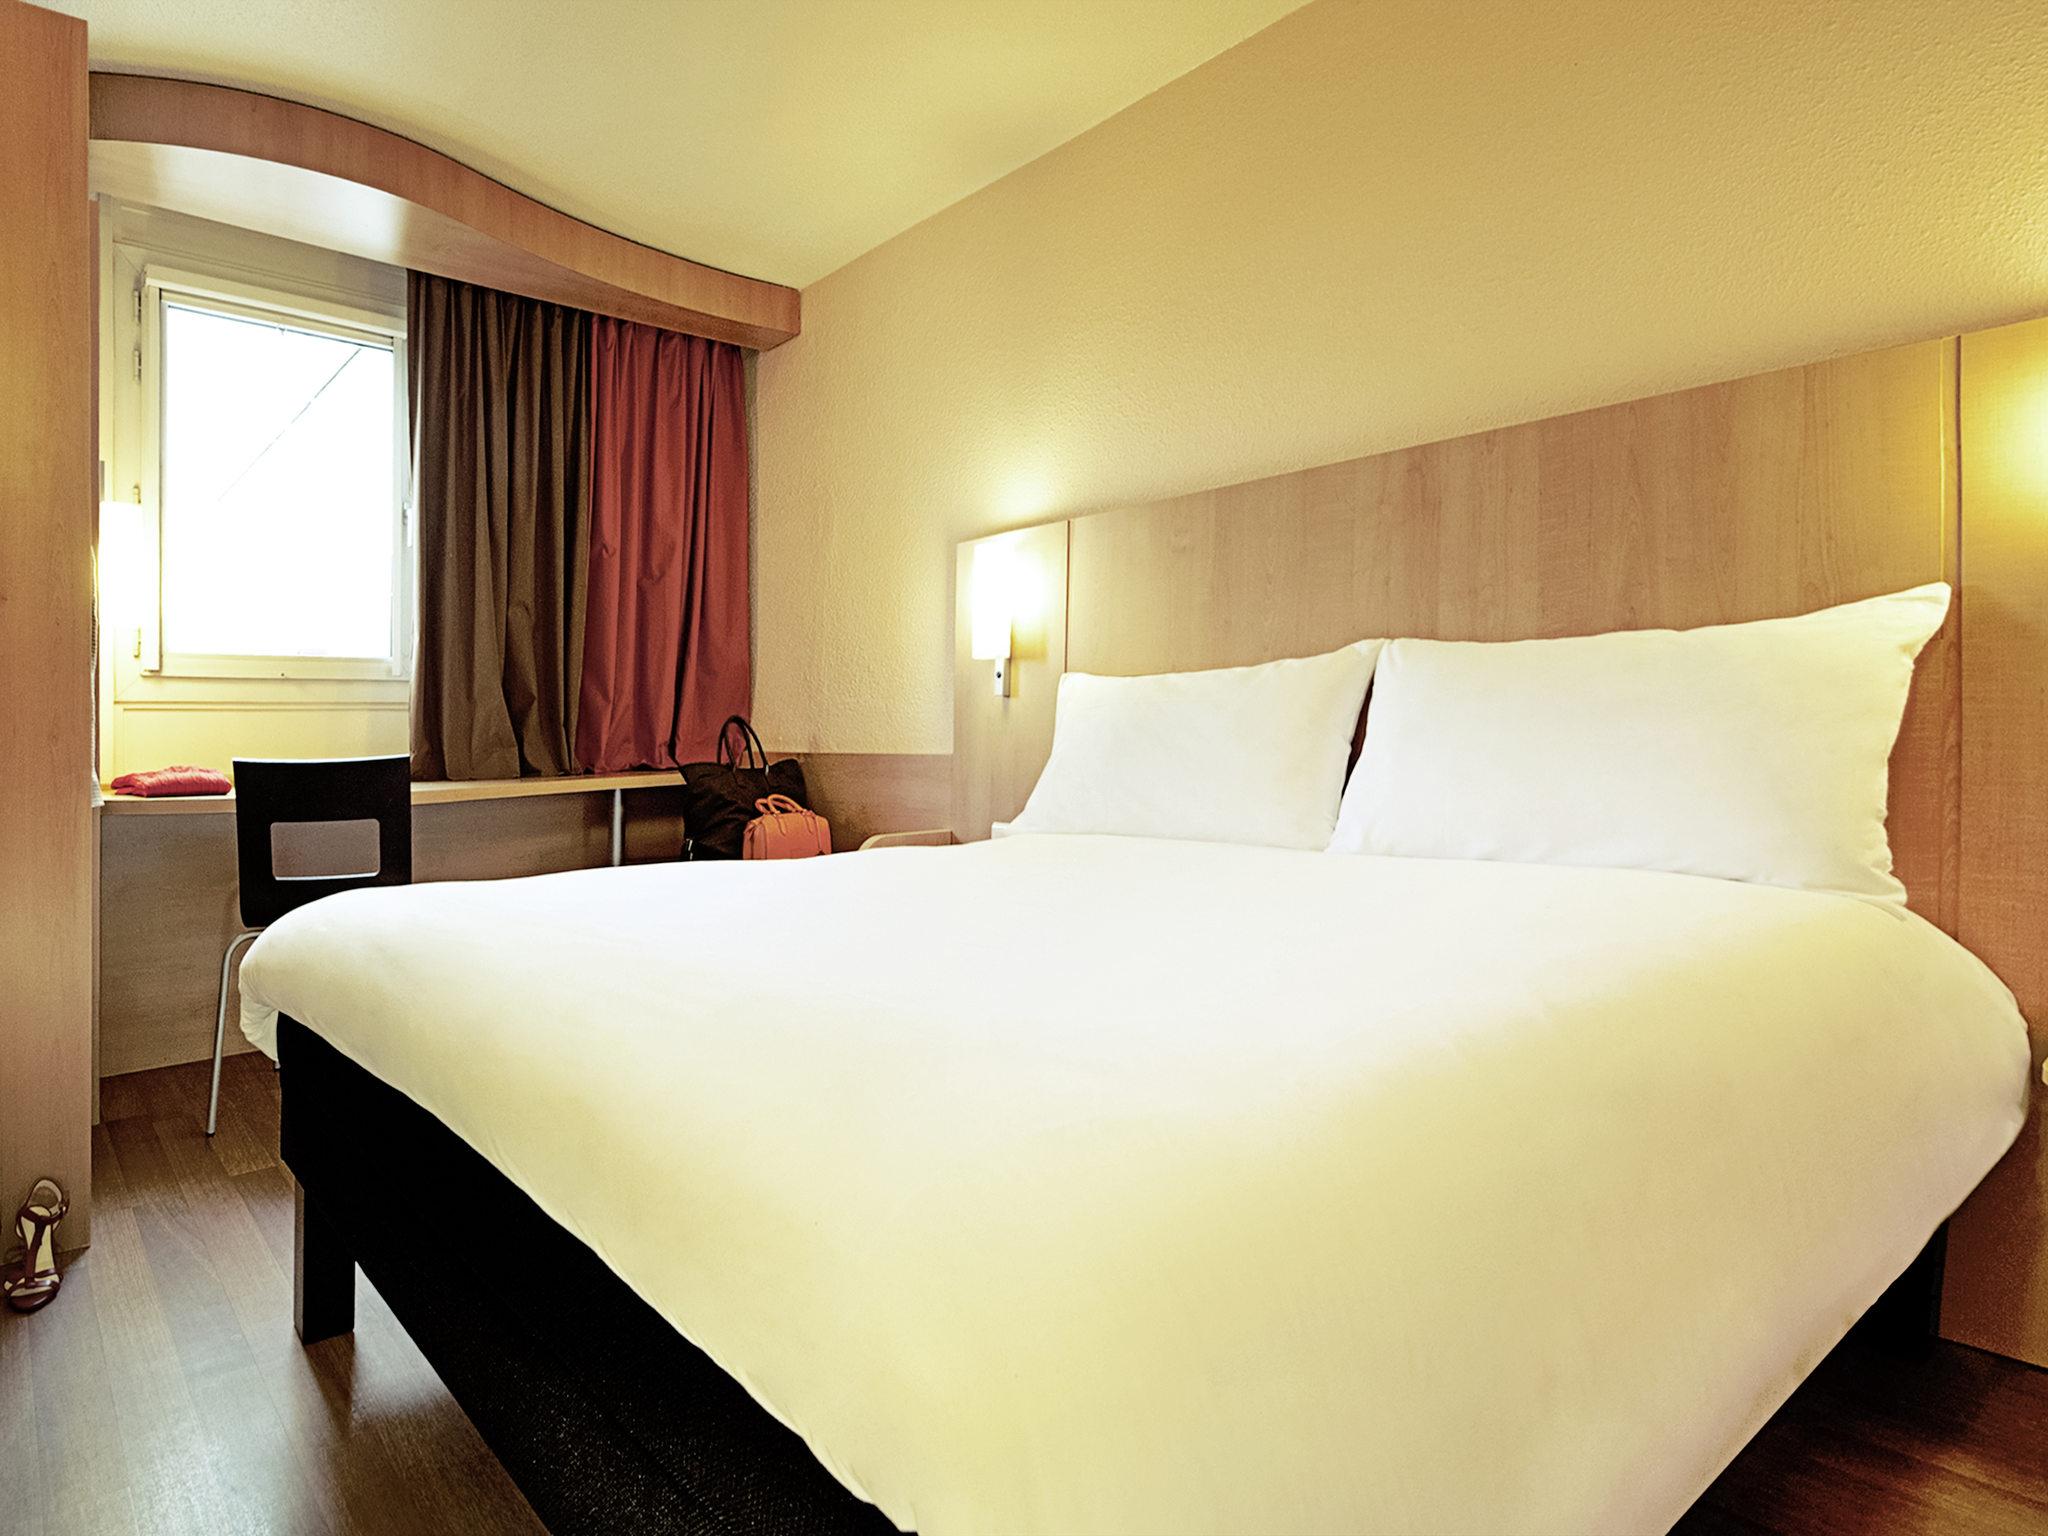 Ibis Tlemcen Hotel A Tlemcen Accorhotels